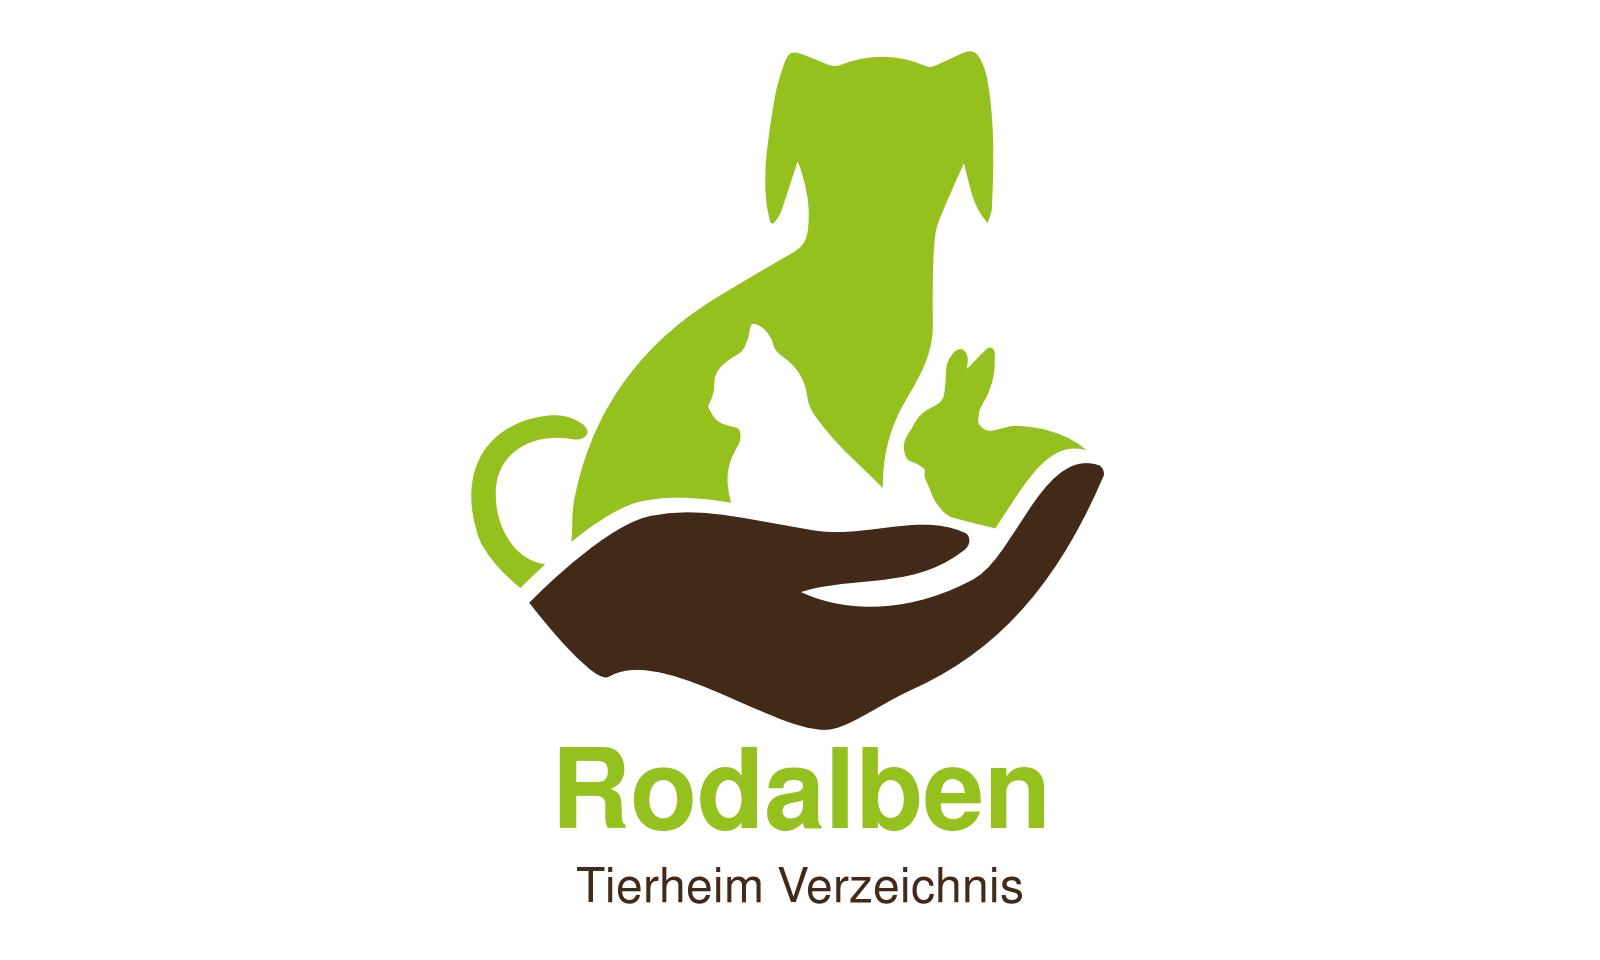 Tierheim Rodalben